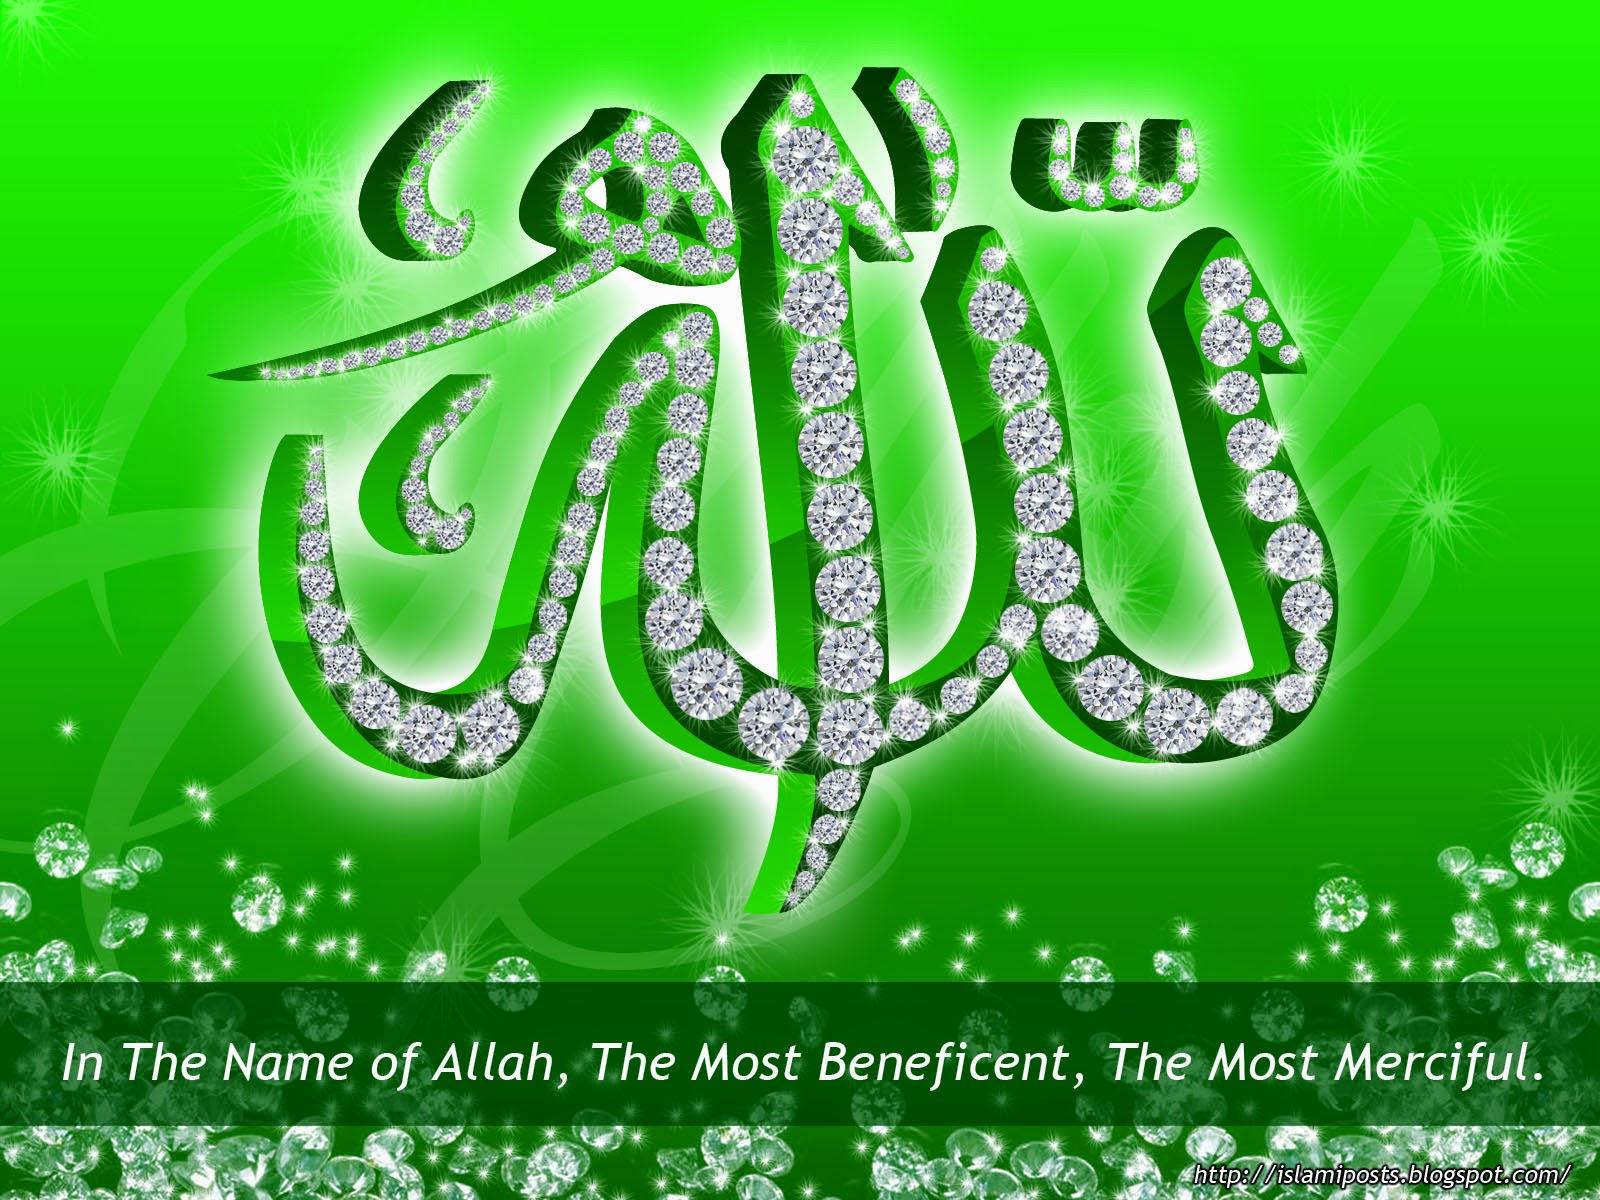 Beautiful name of Allah in green ground